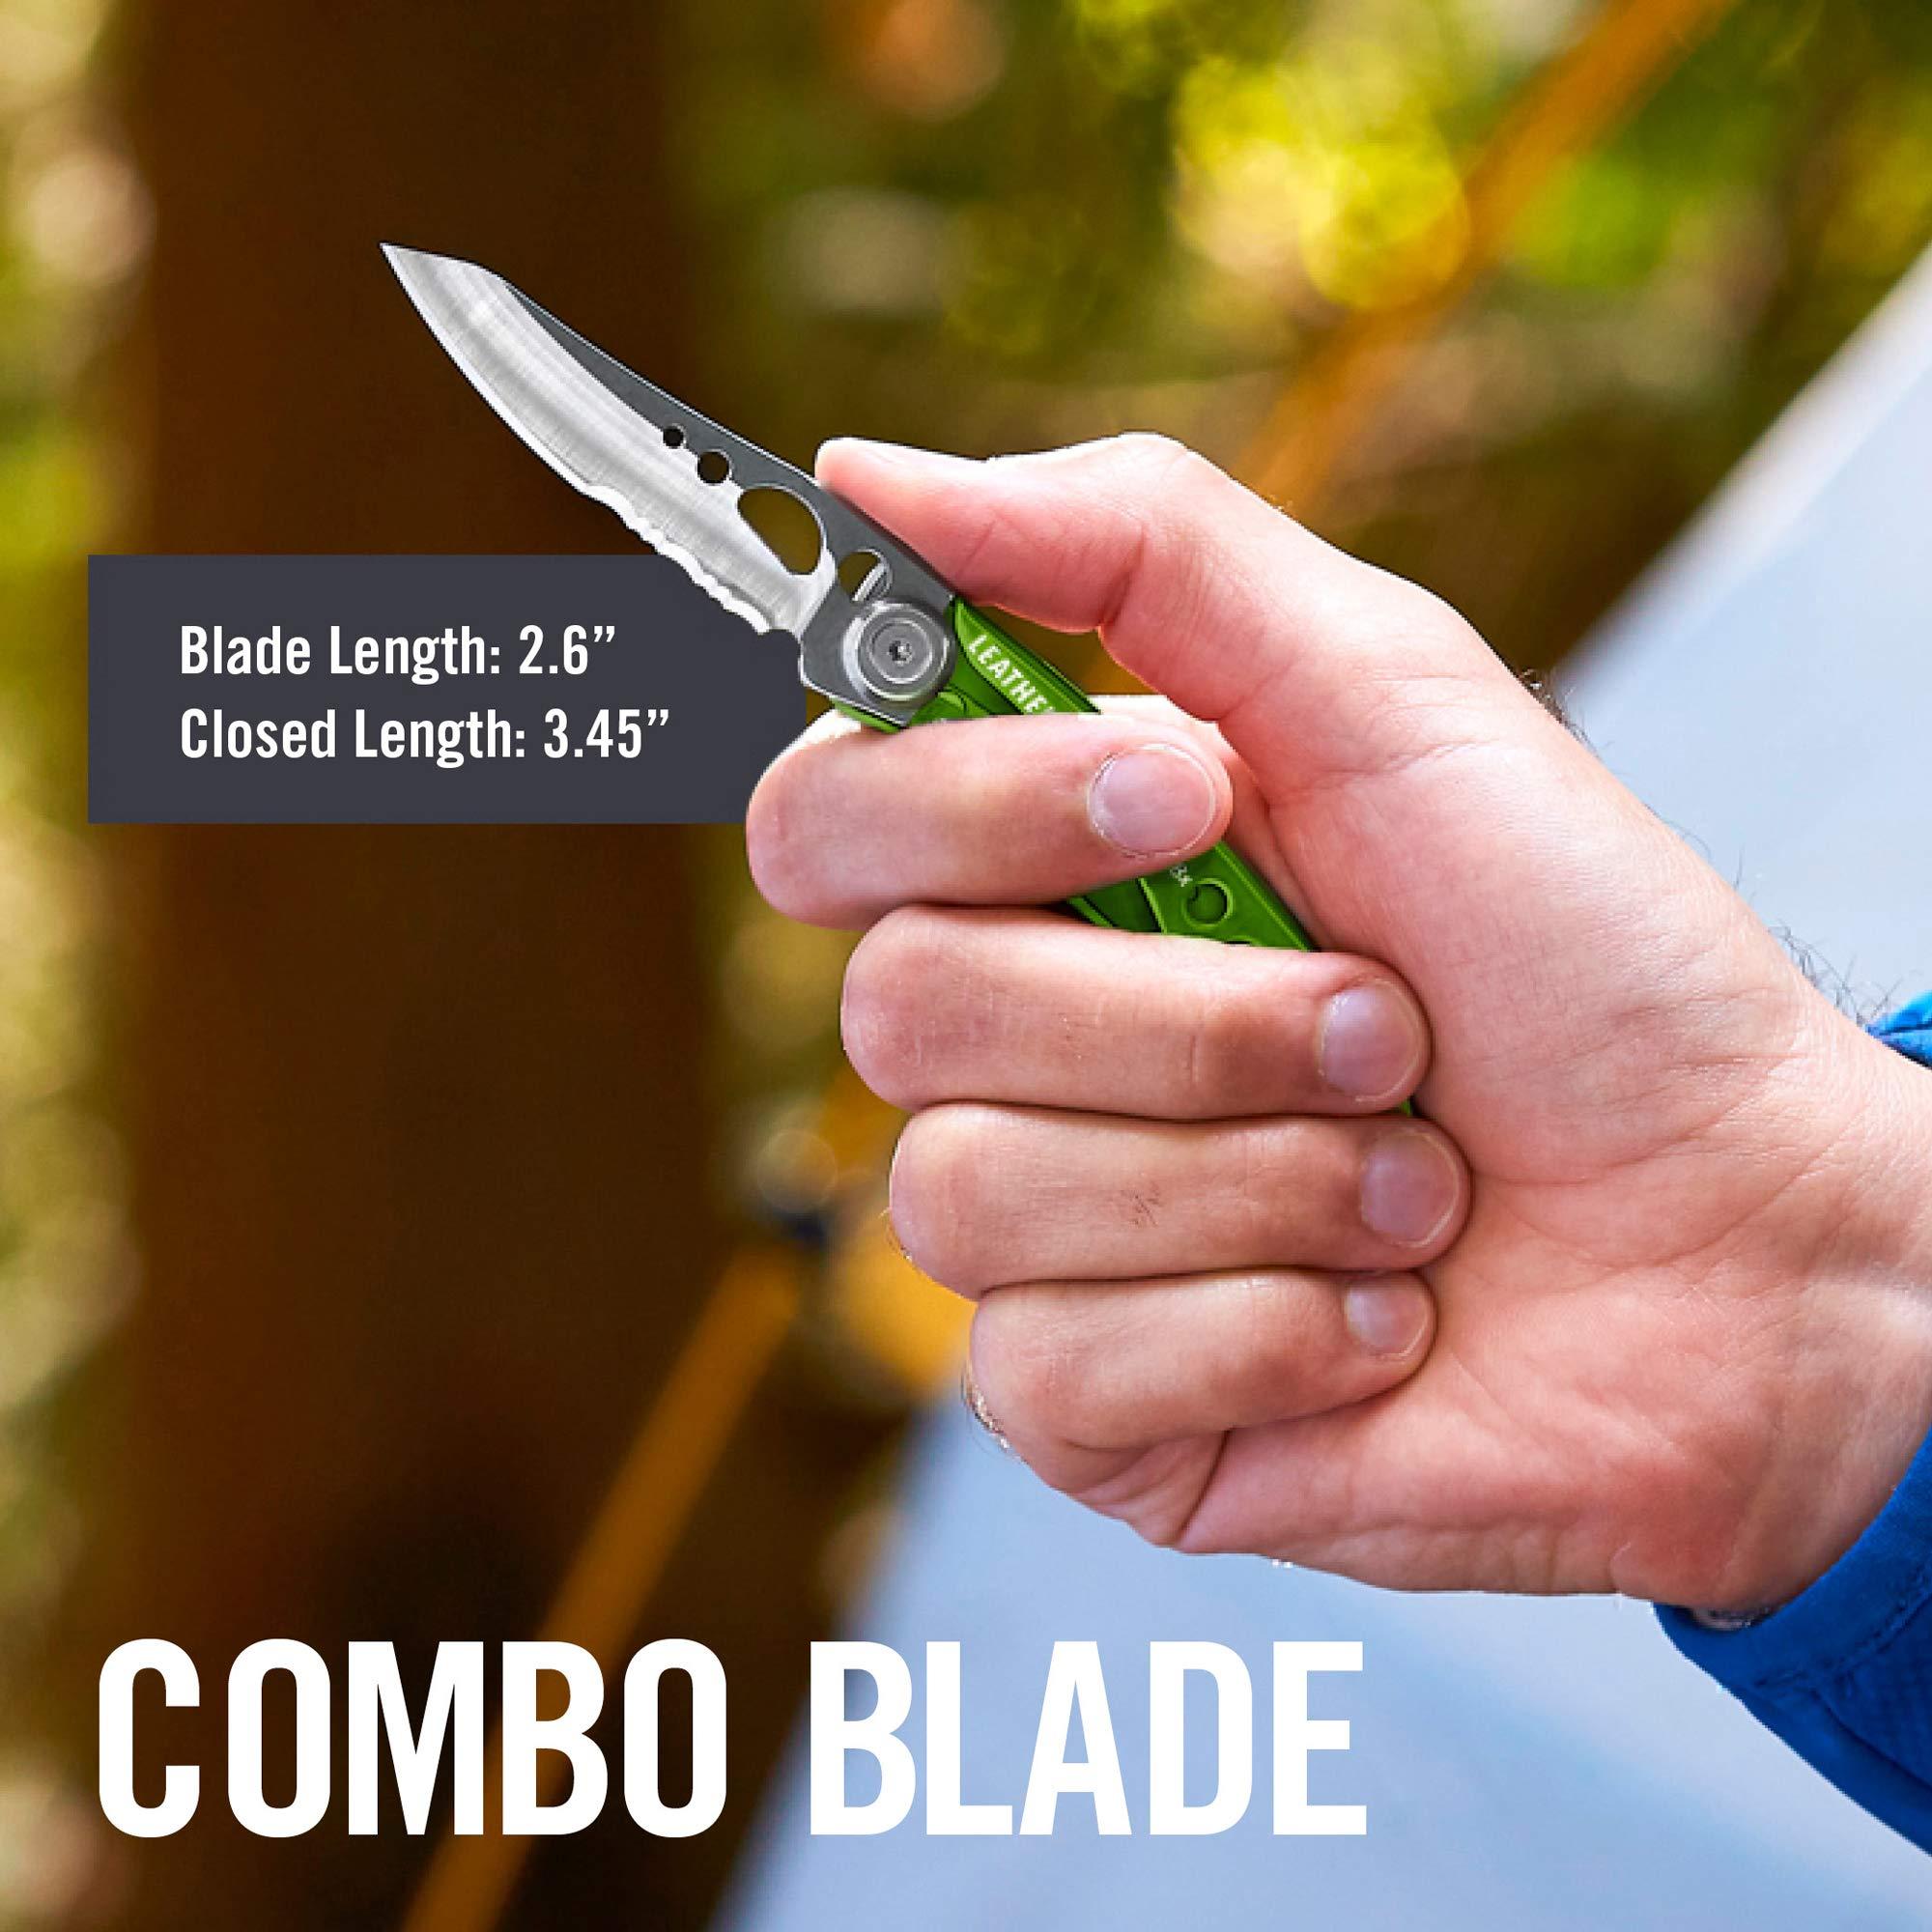 LEATHERMAN - Skeletool KBX Pocket Knife with Bottle Opener, Moss Green by LEATHERMAN (Image #8)